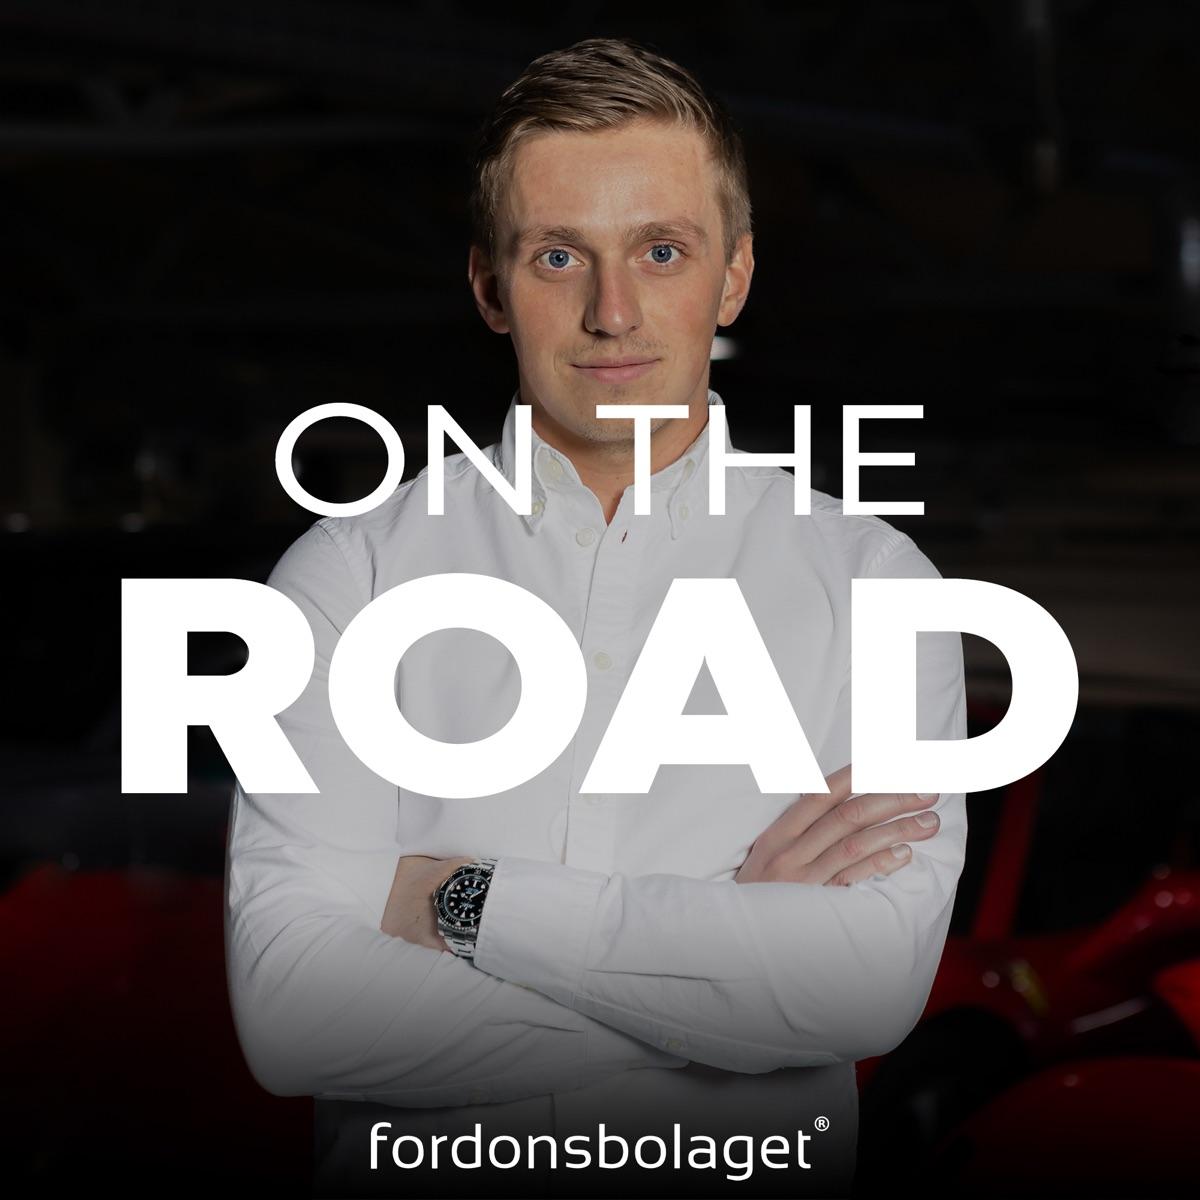 On the road - Fordonsbolaget